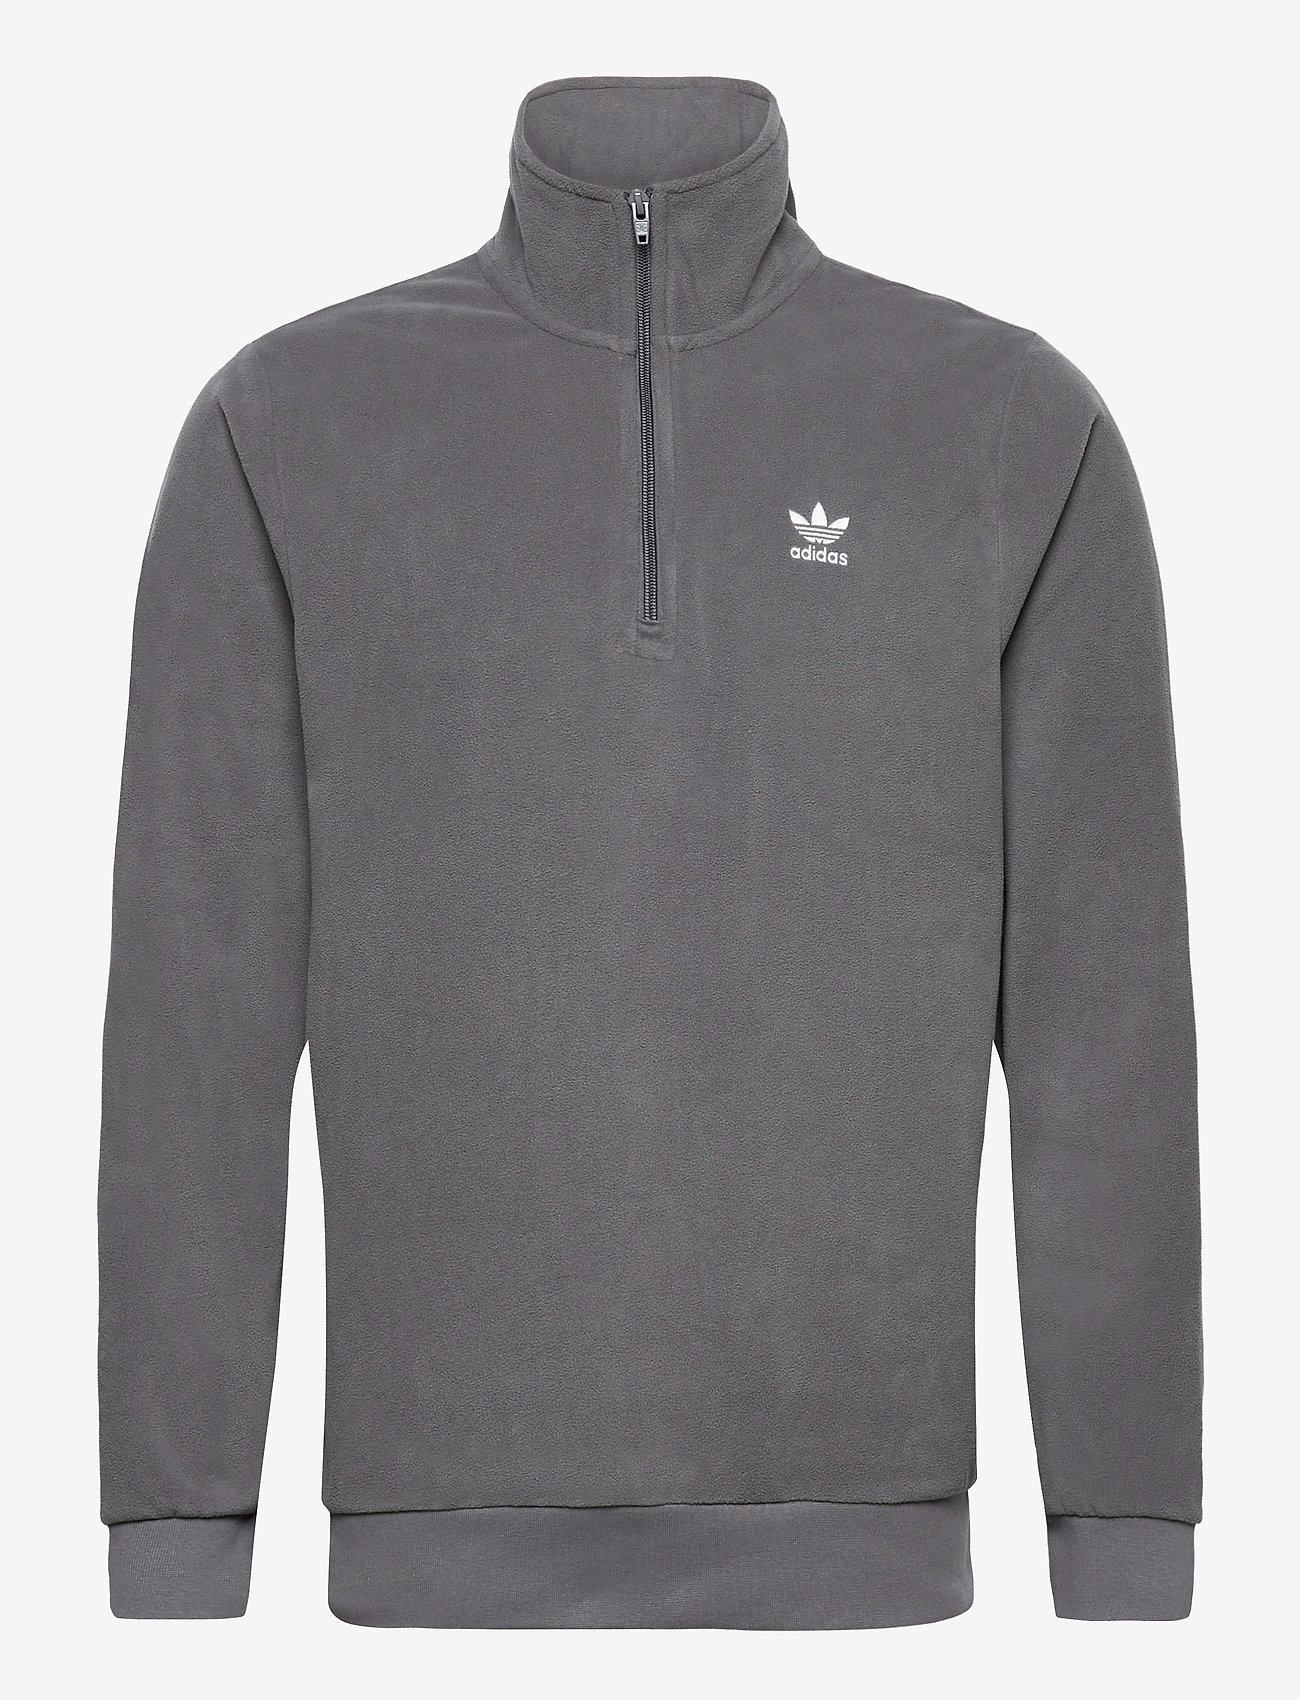 adidas Originals - Adicolor Essentials Polar Fleece Half-Zip Sweatshirt - basic sweatshirts - grefiv - 1